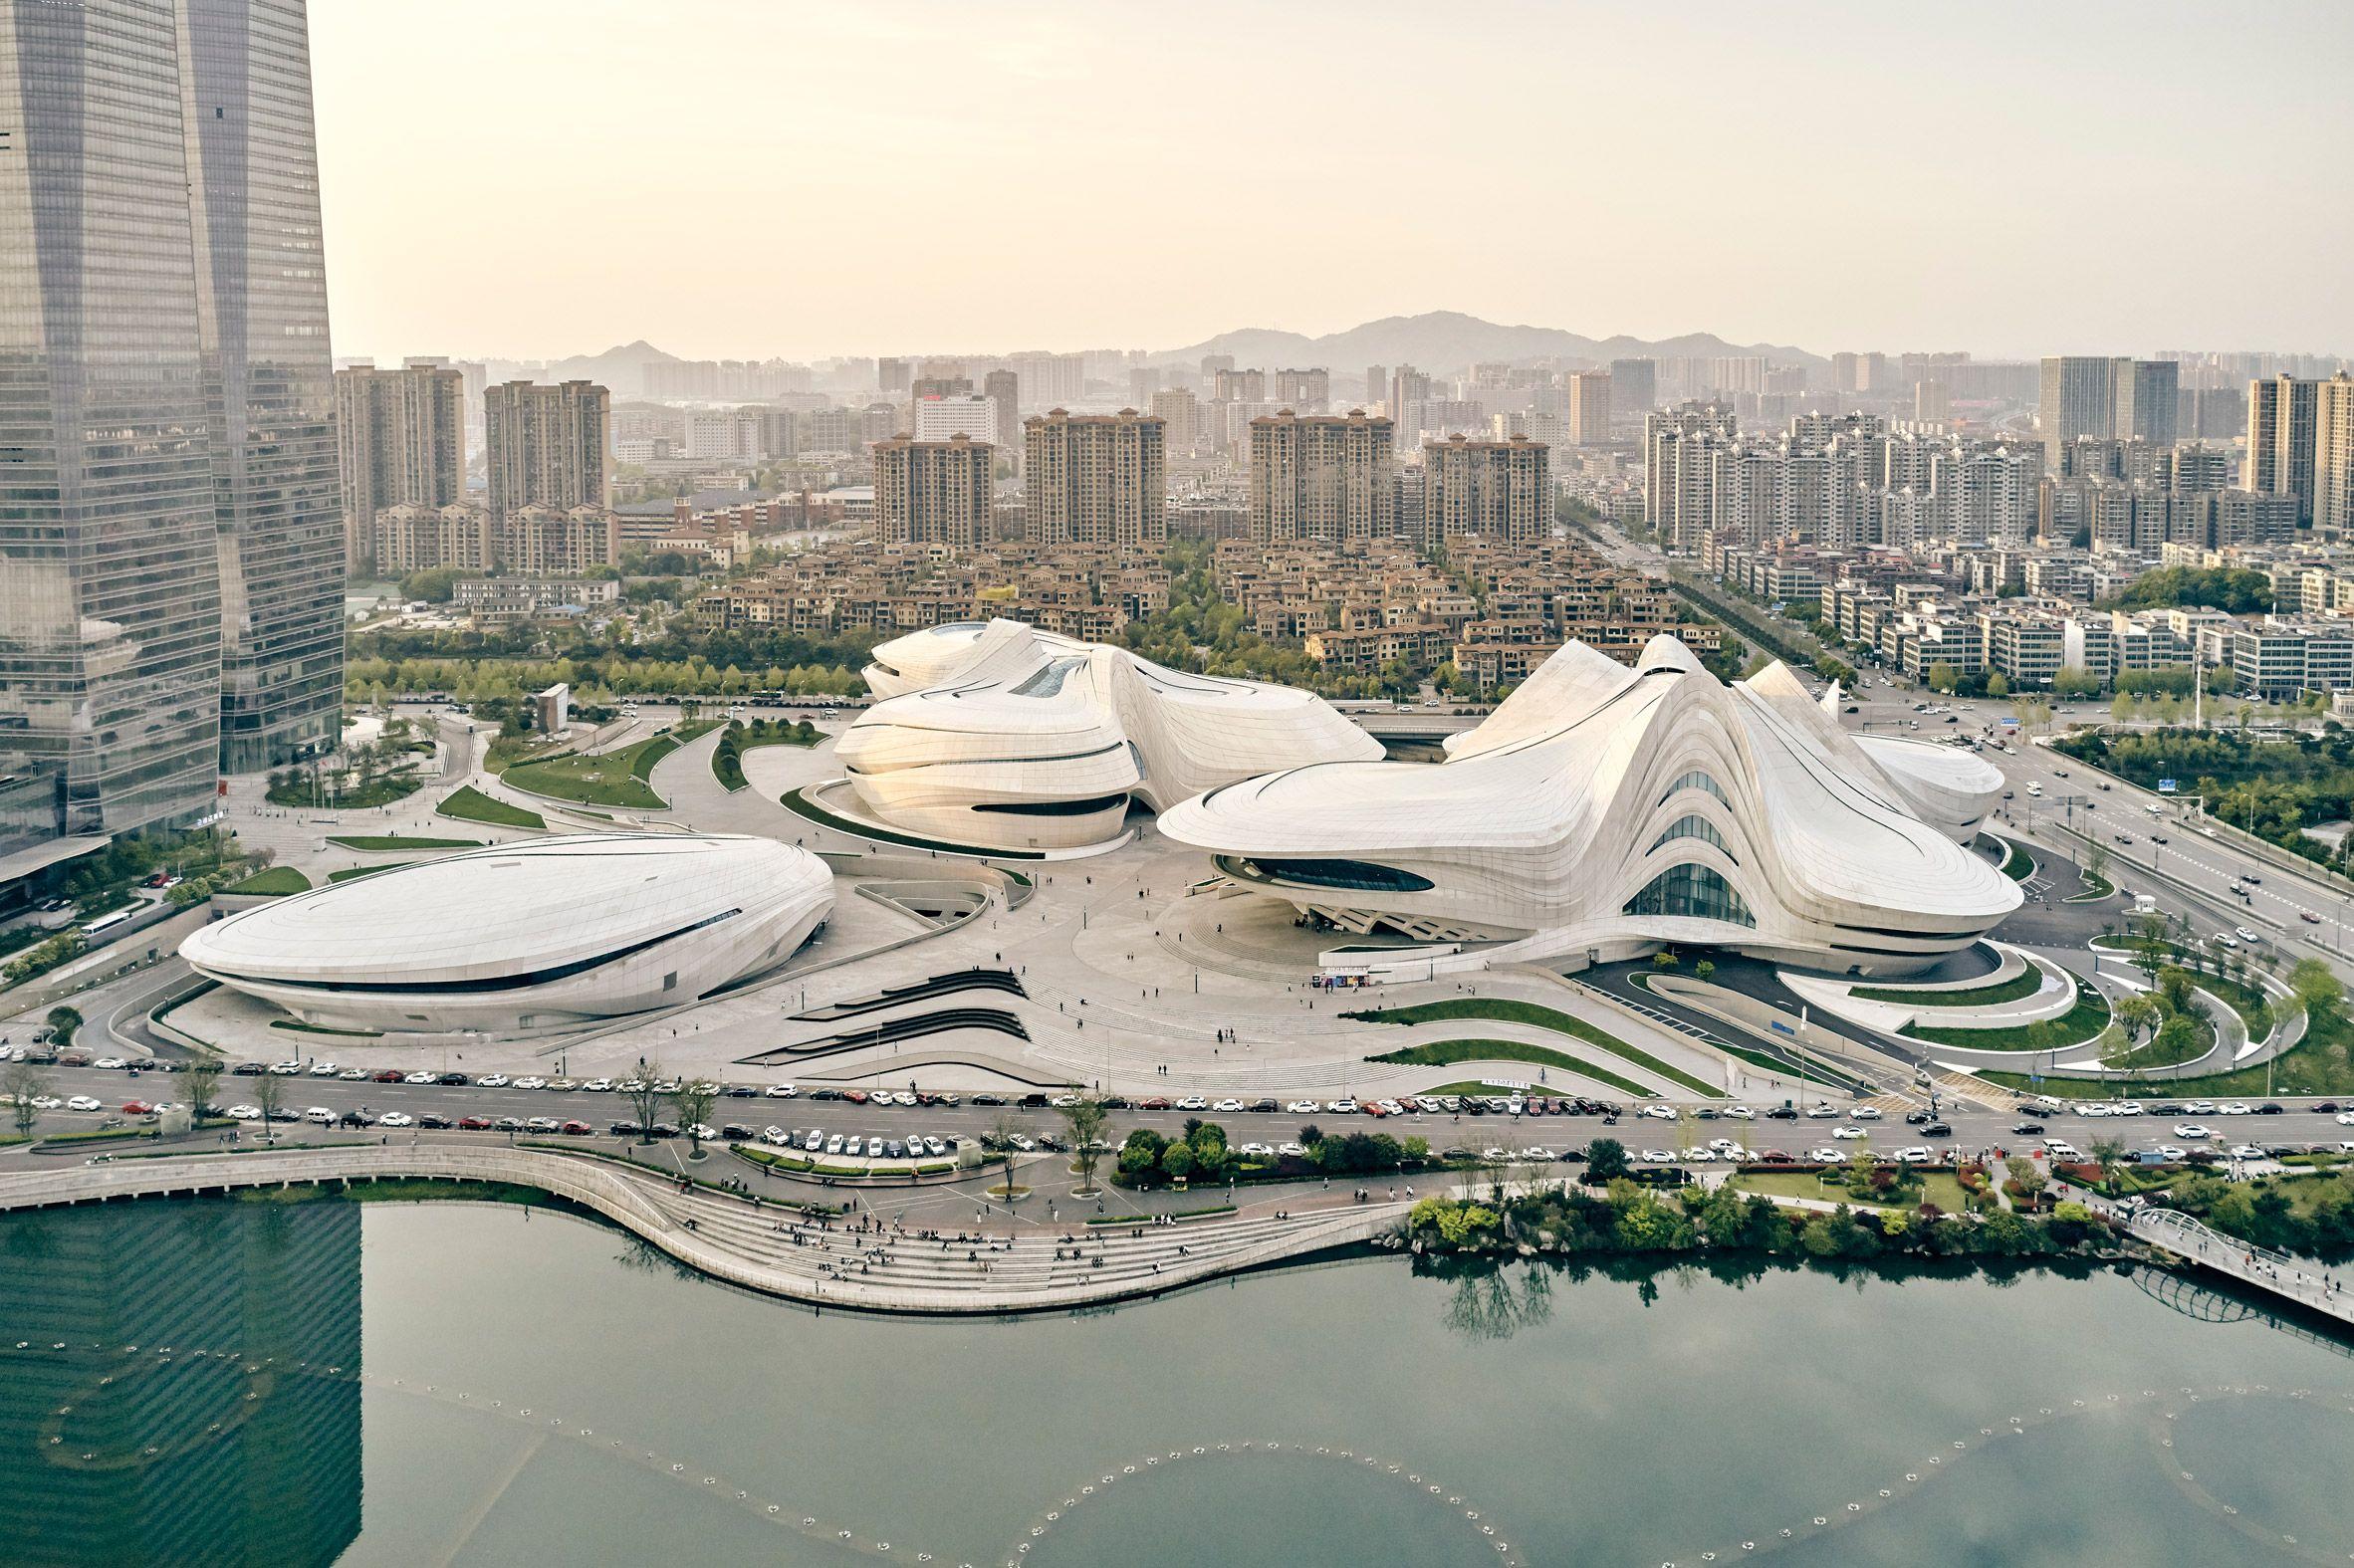 Zaha Hadid Architects Changsha Meixihu International Culture And Art Centre Nears Completion Zaha Zaha Hadid Zaha Hadid Architects